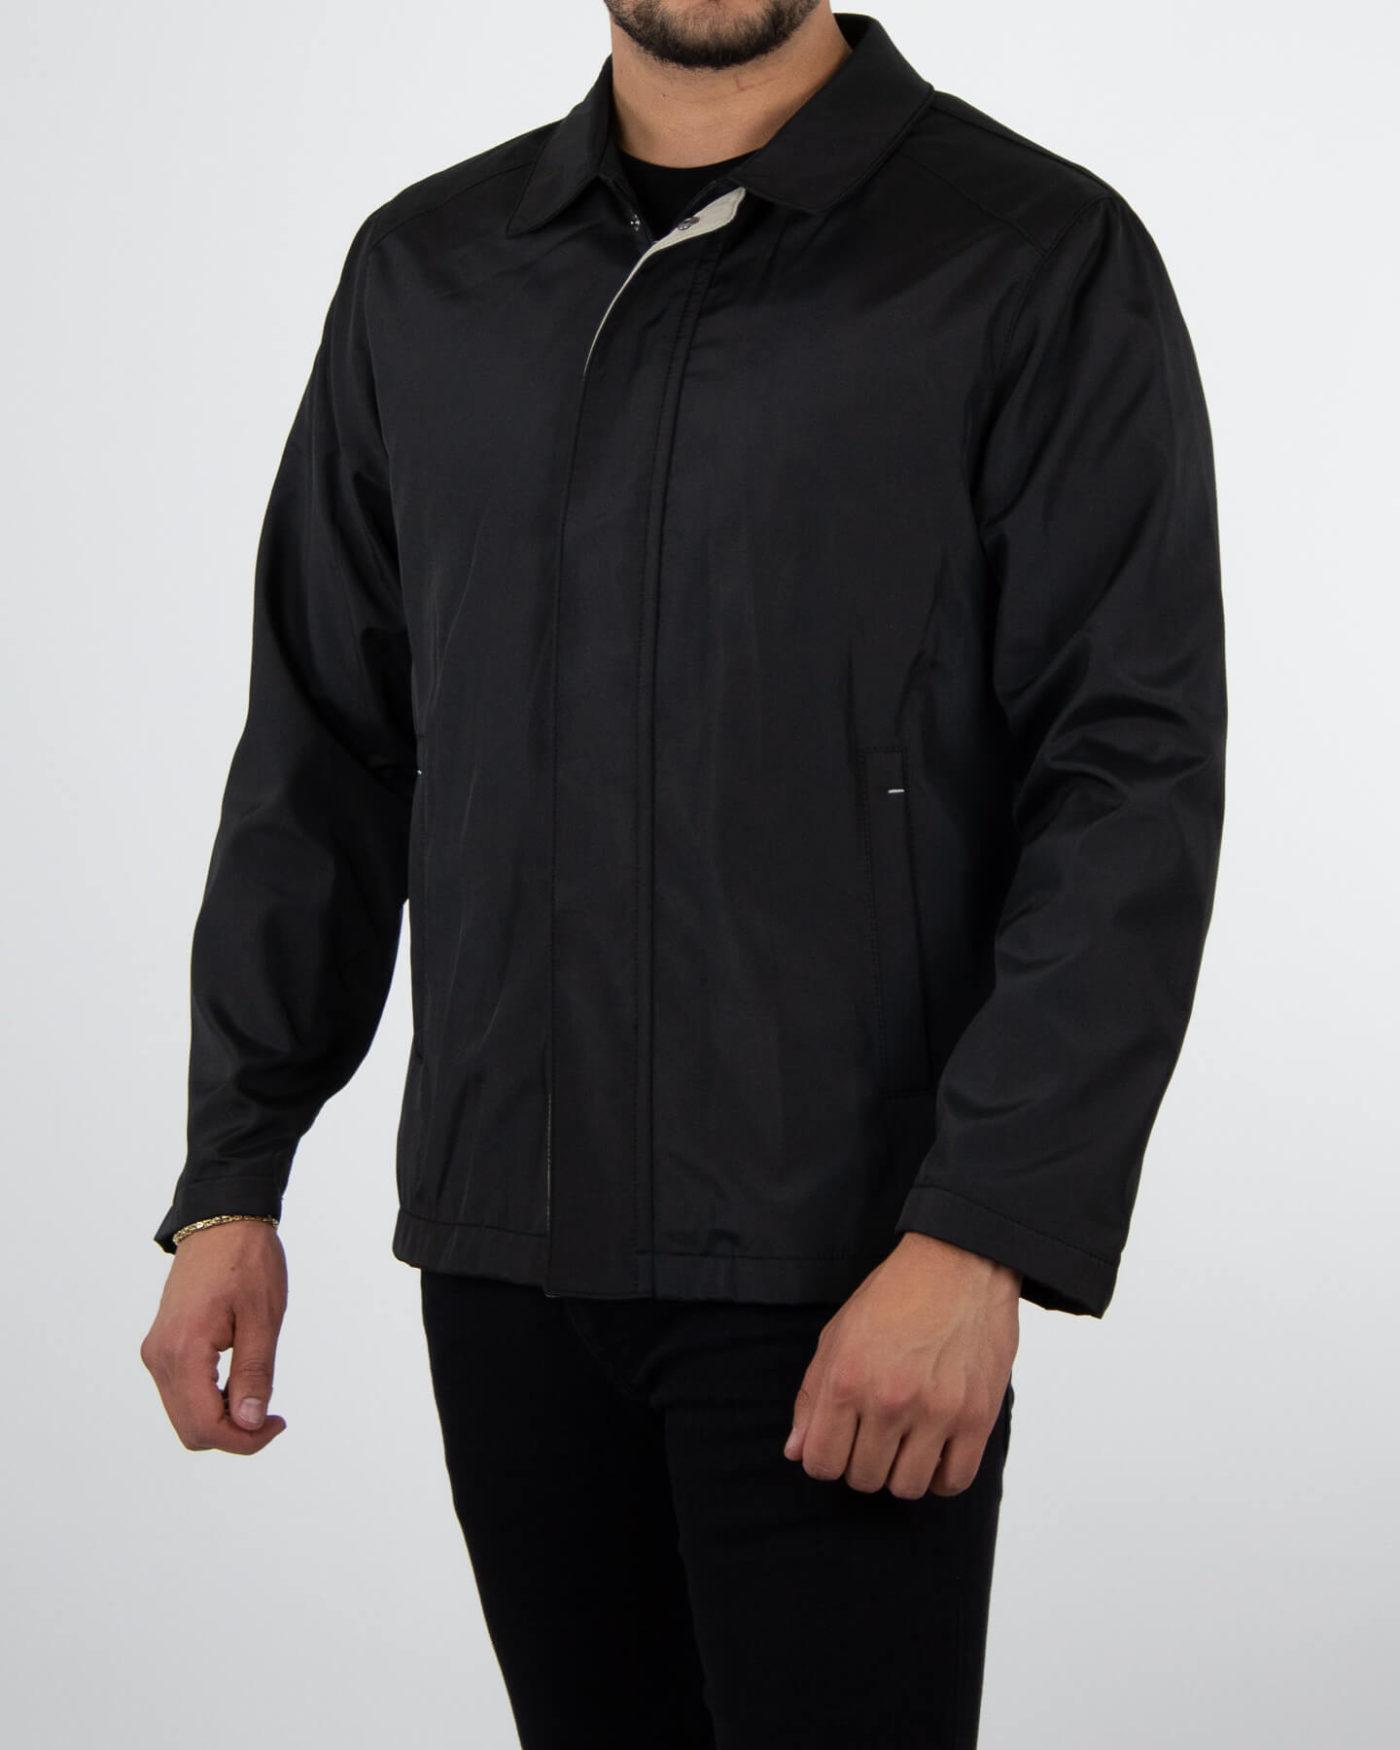 Richesse Trenchcoat Black-2